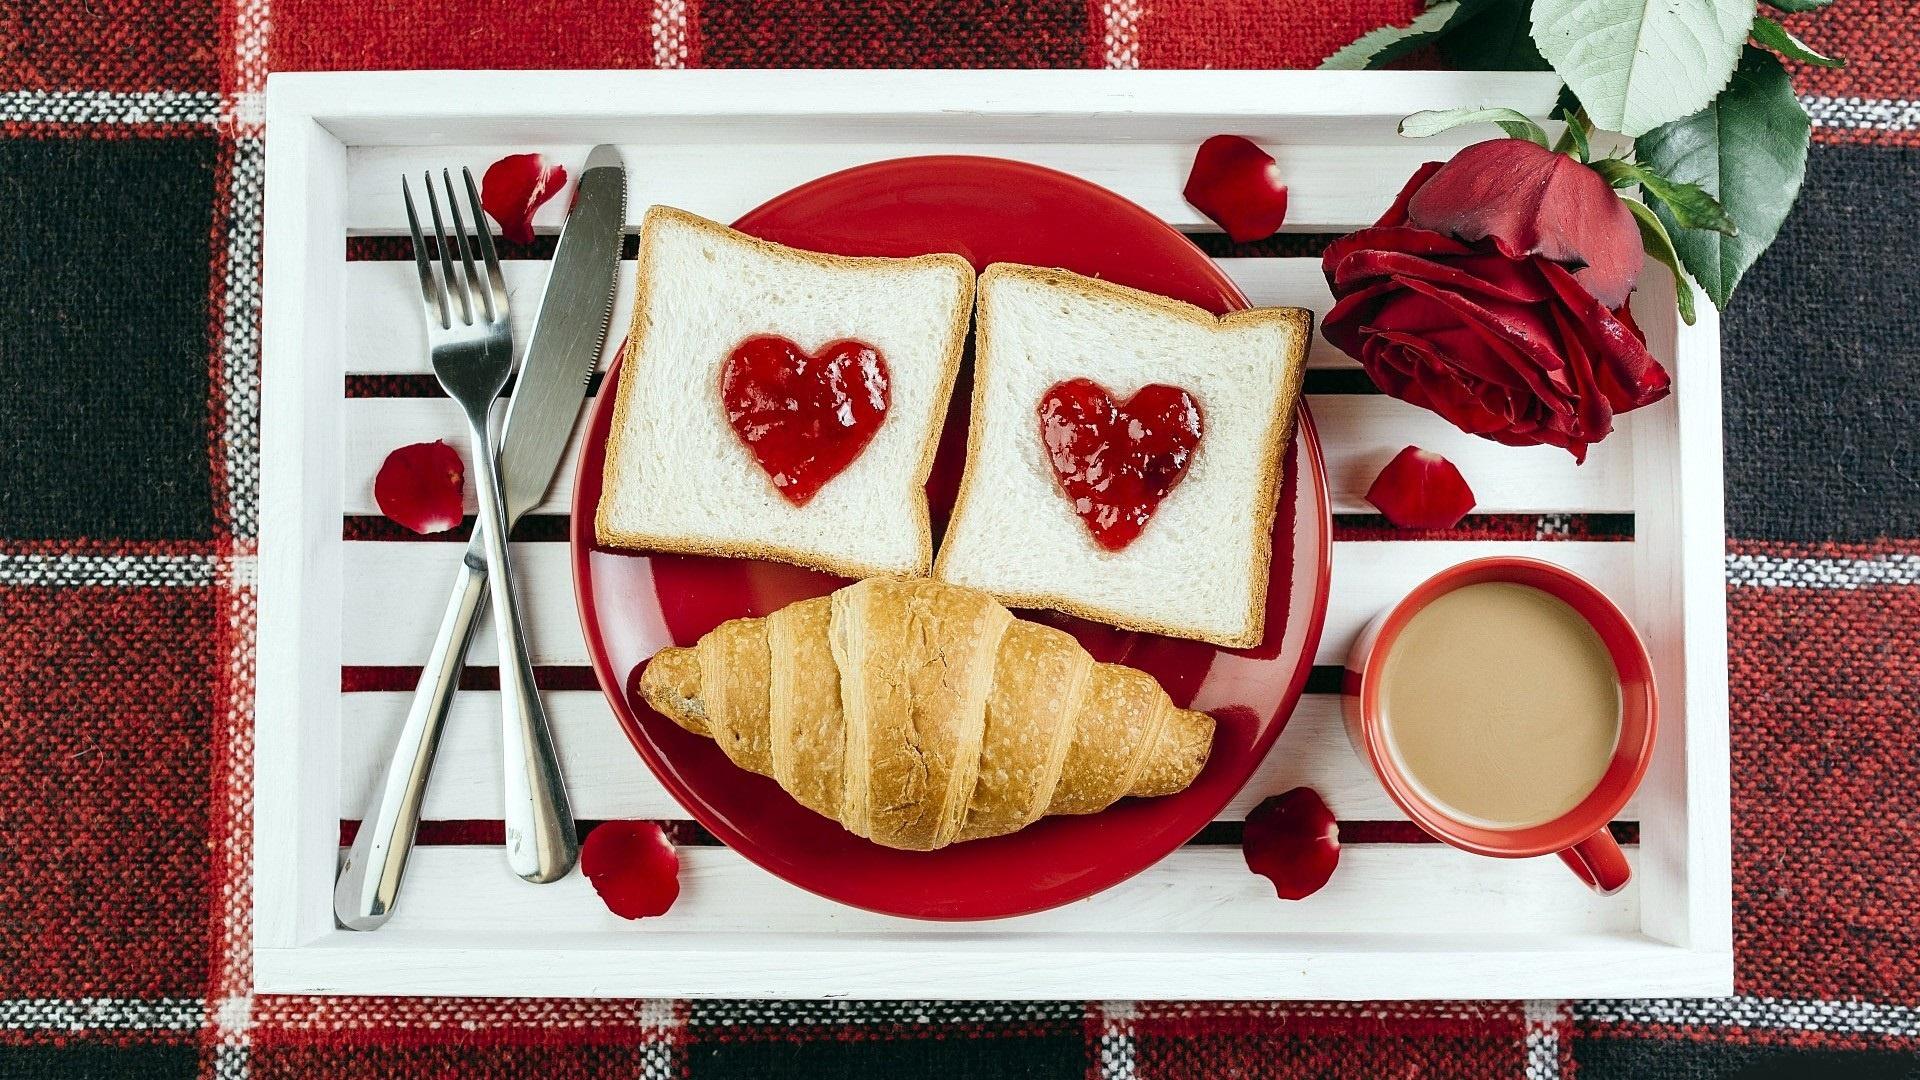 Будь, открытка обед для любимой